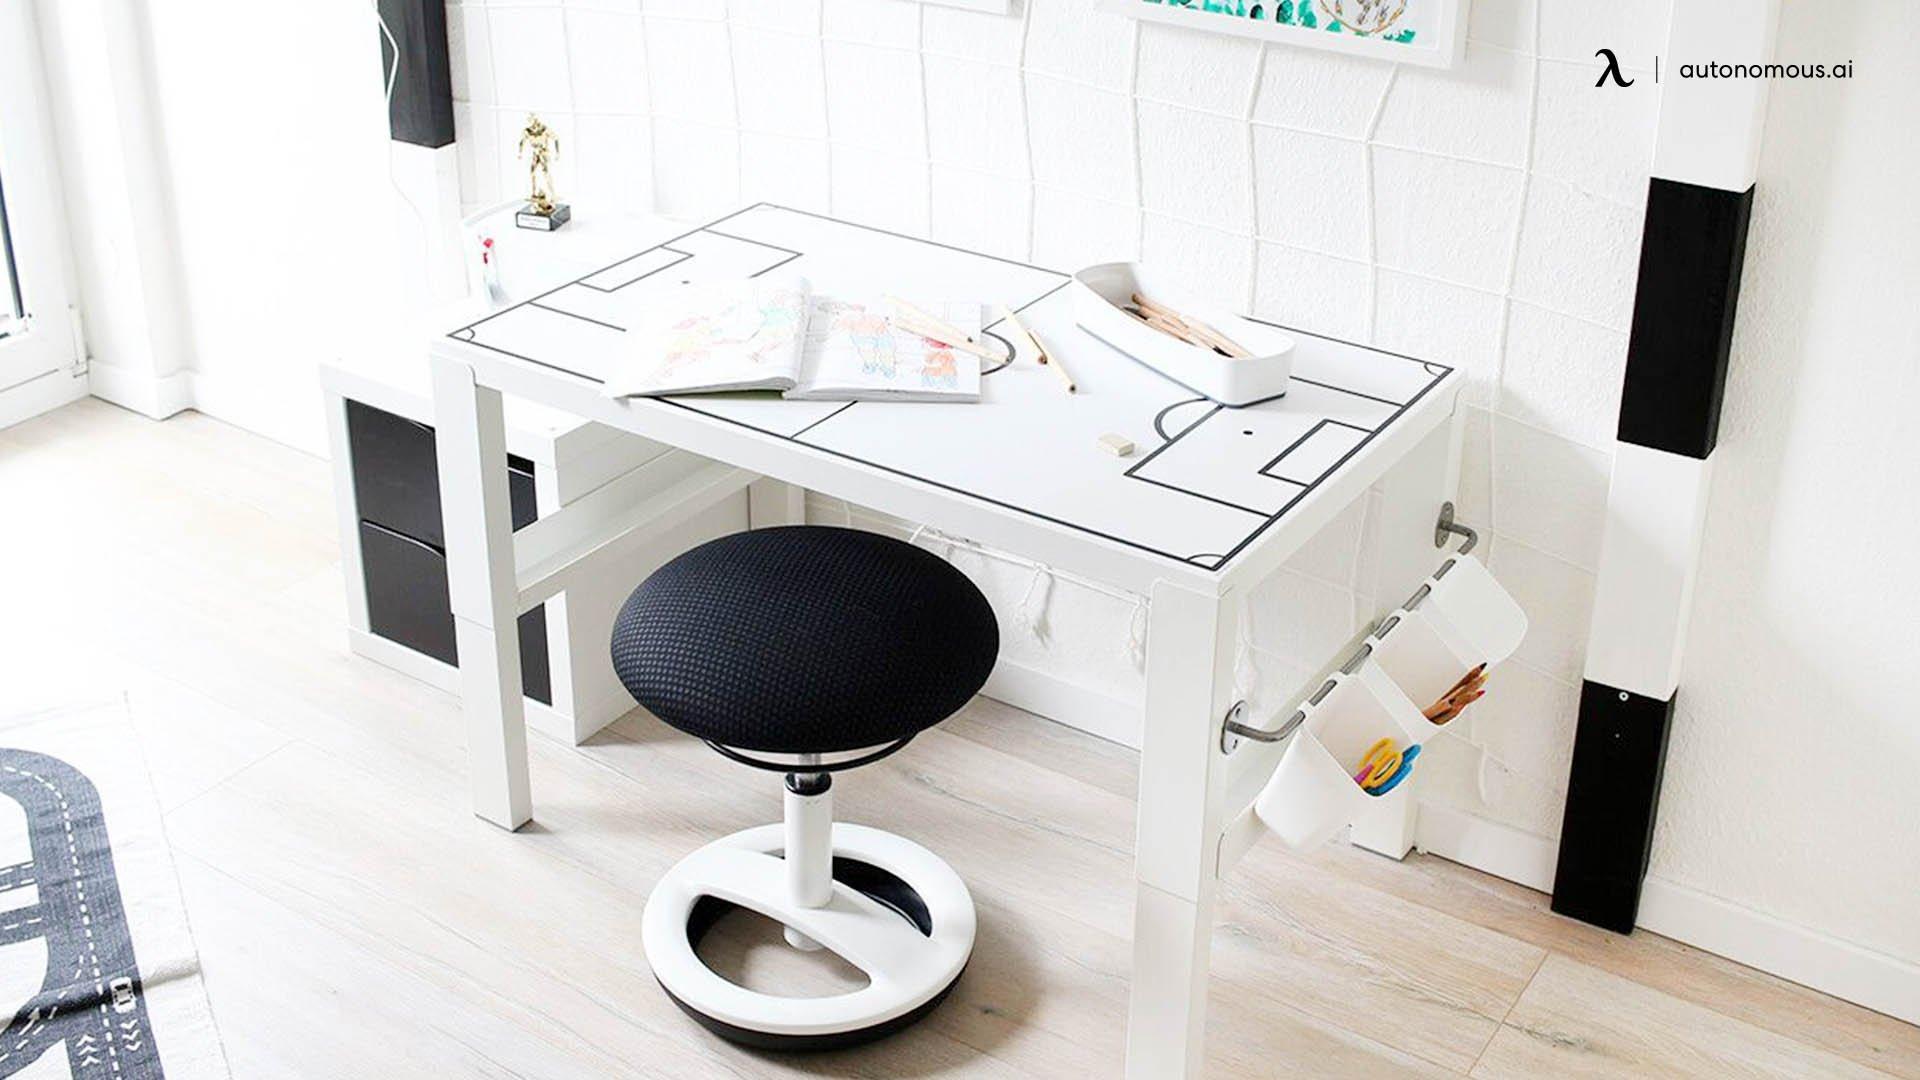 The IKEA Pahl Desk